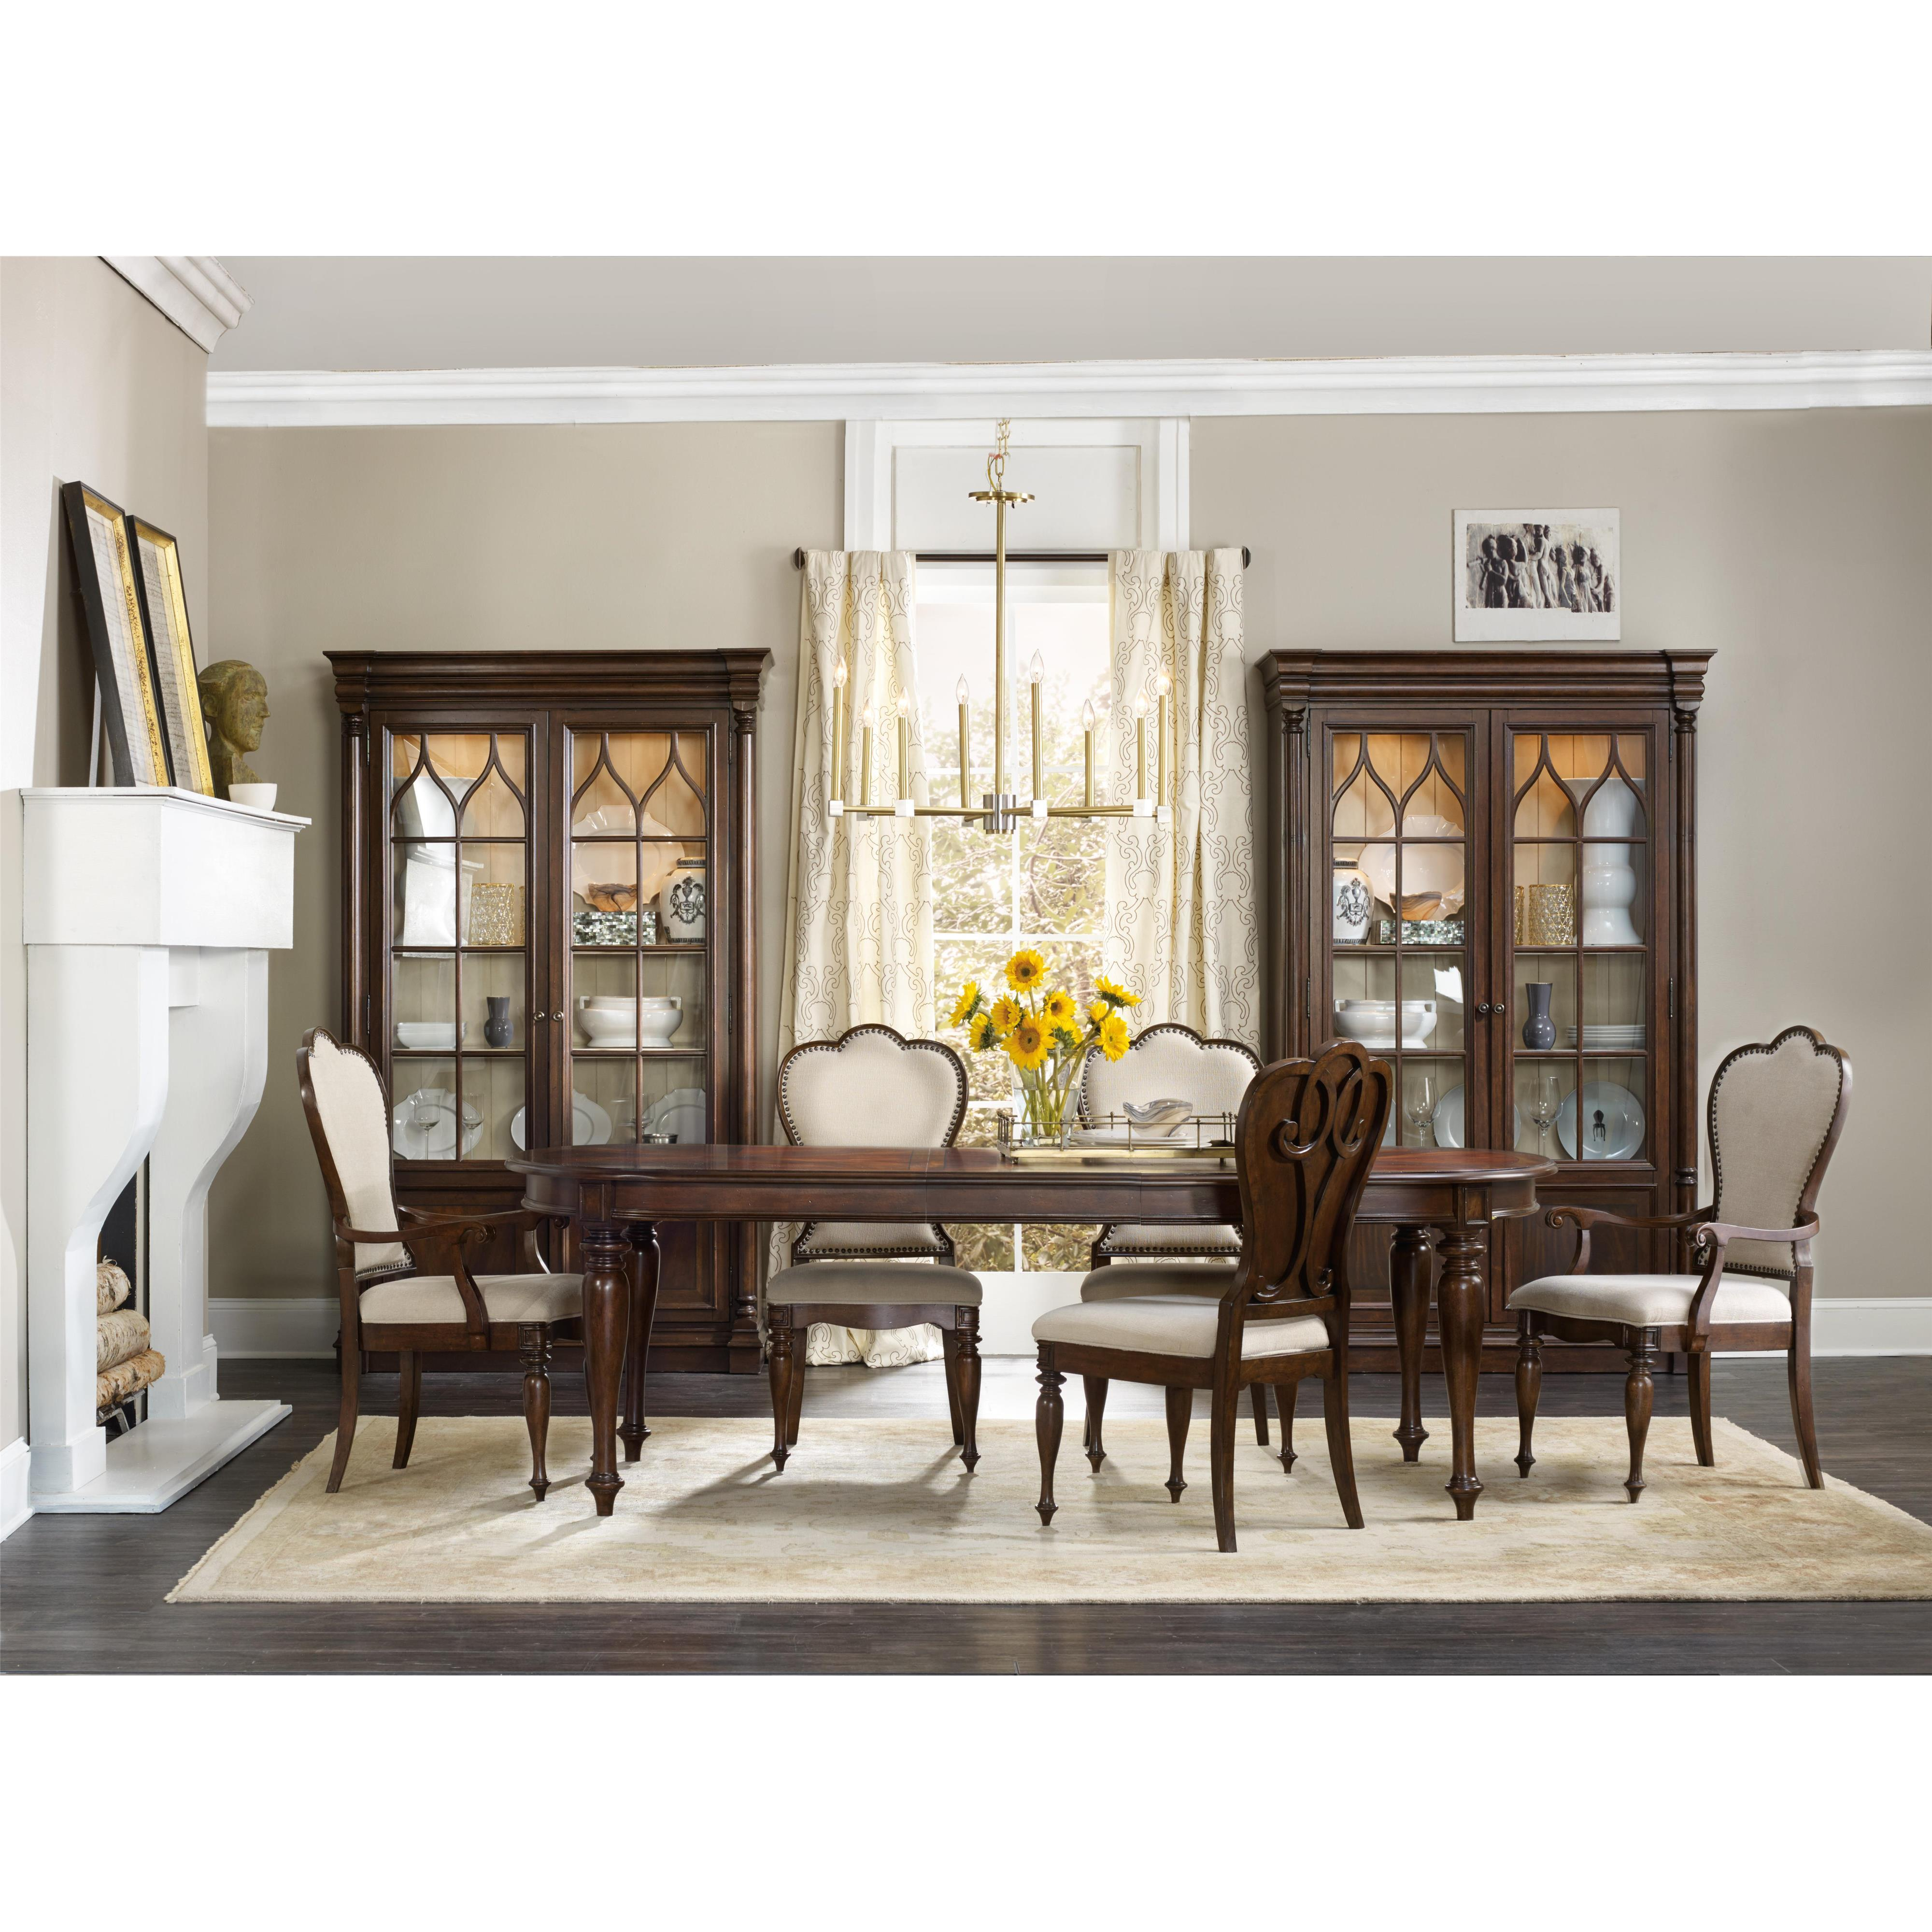 Hooker Furniture Leesburg Buffet With Silverware Tray Liner   Belfort  Furniture   Buffets